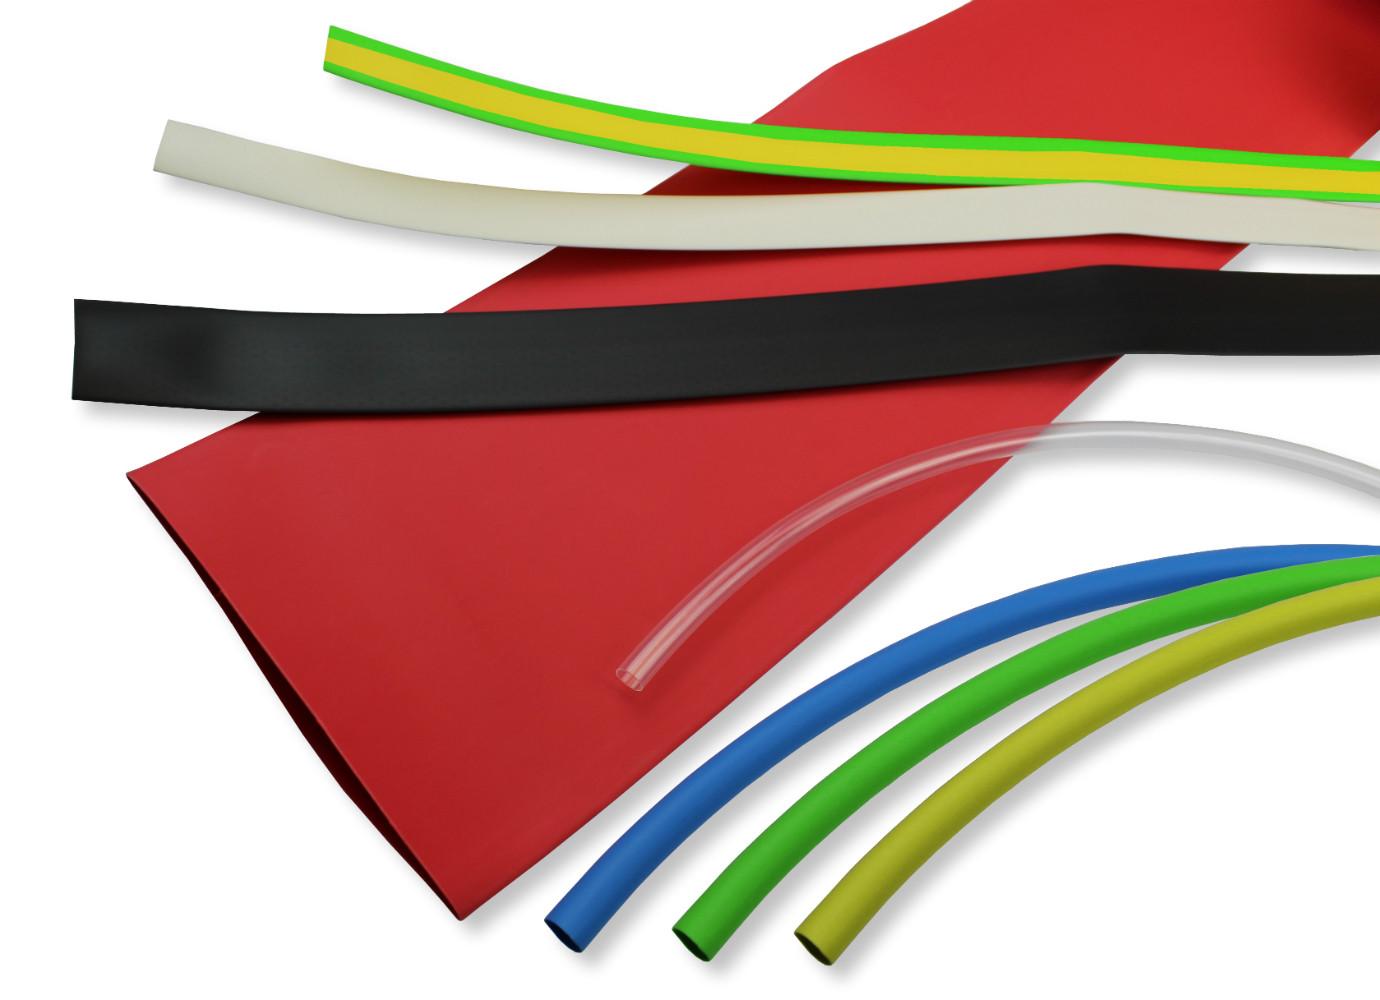 PREMIUM Heat Shrink Tubing 3:1 Ratio HSP3 size 12.0mm I.D / 4.0mm I.D Red